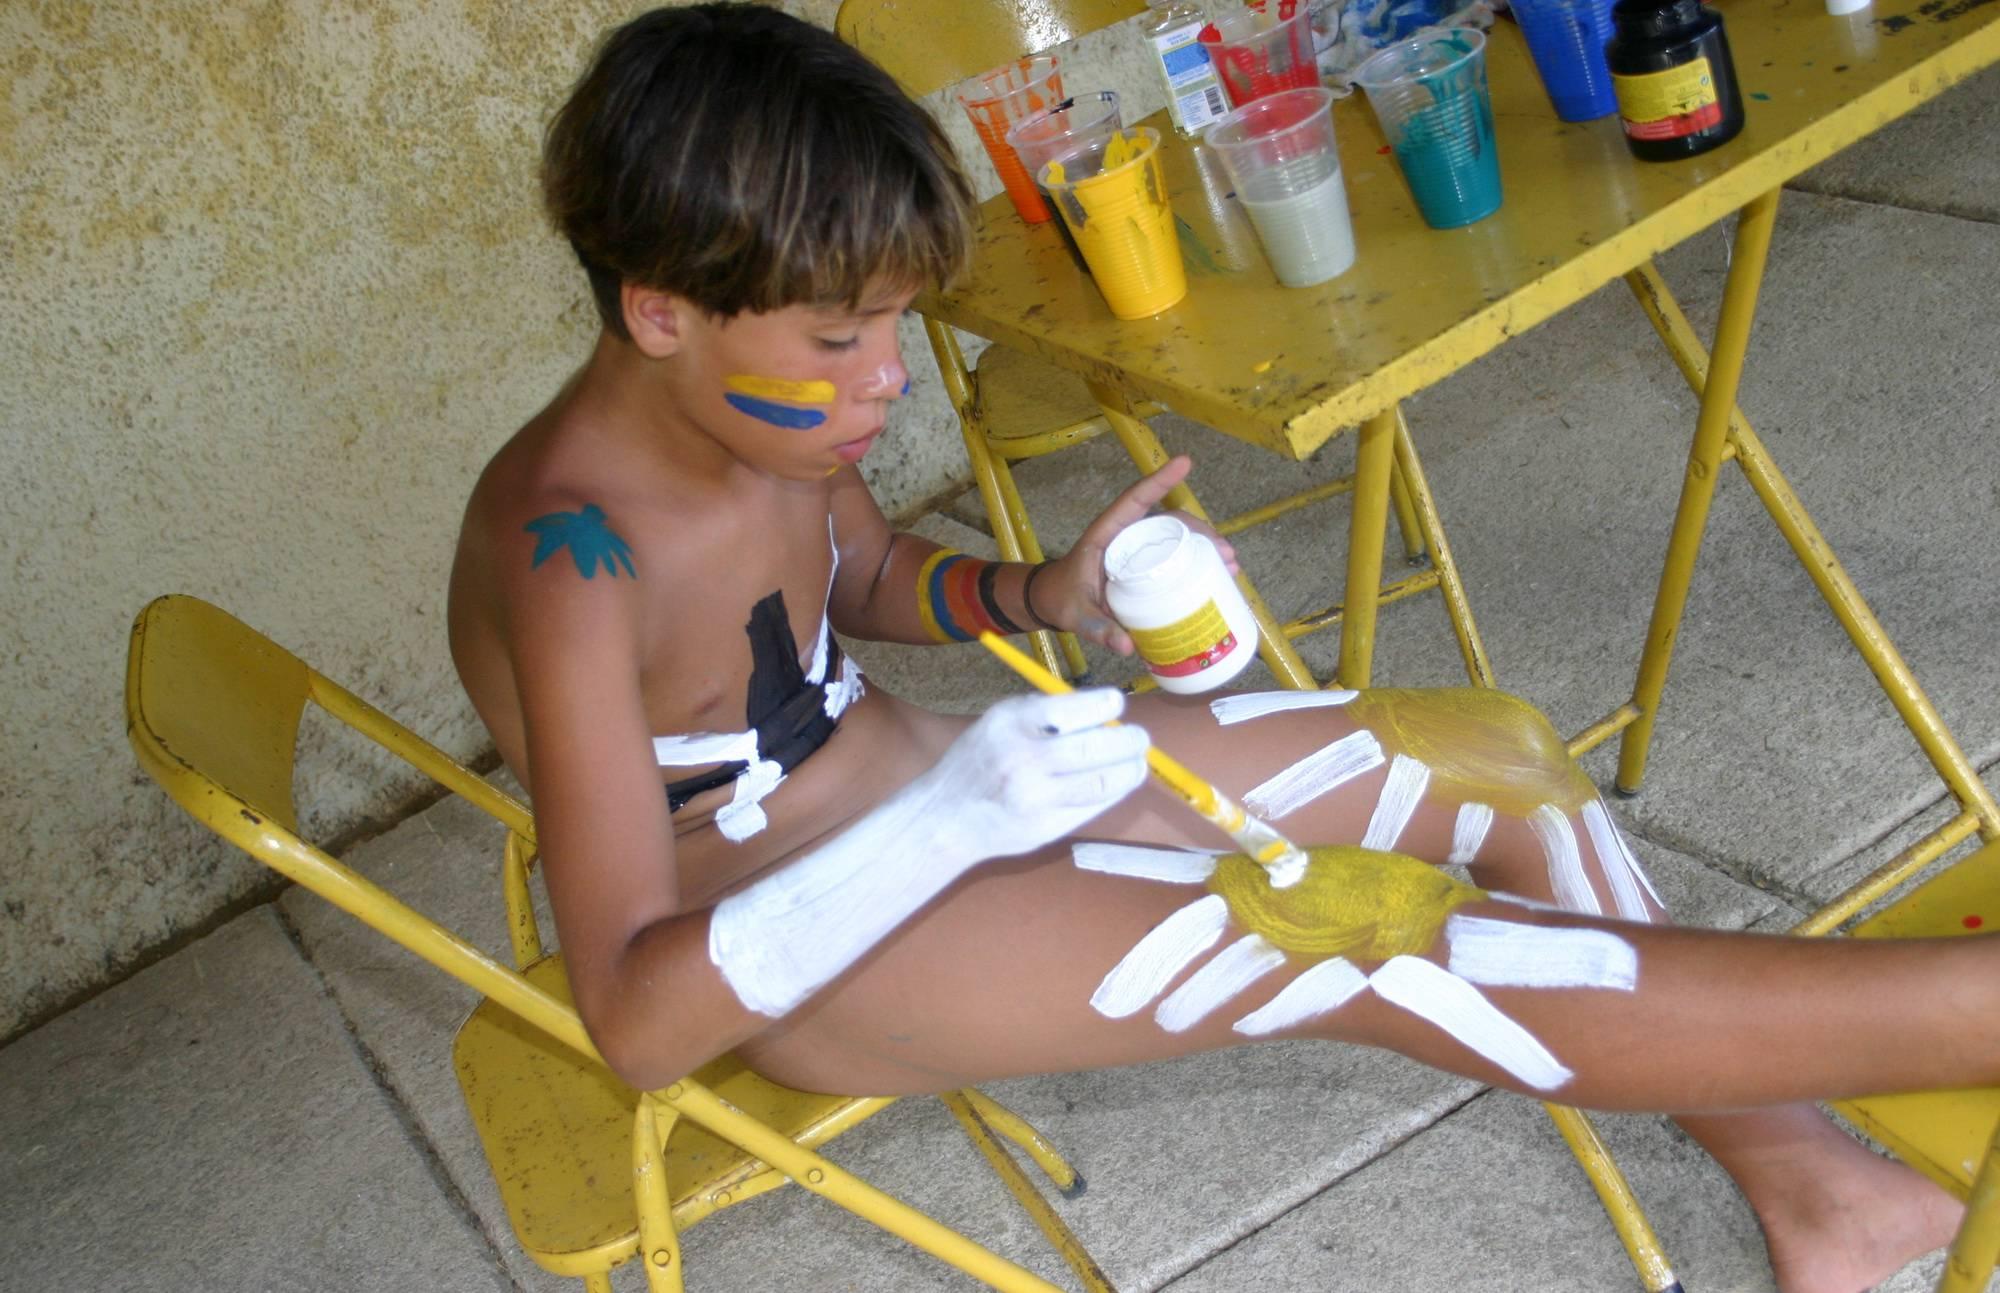 Nudist Pics Brazilian Self Body Paints - 1